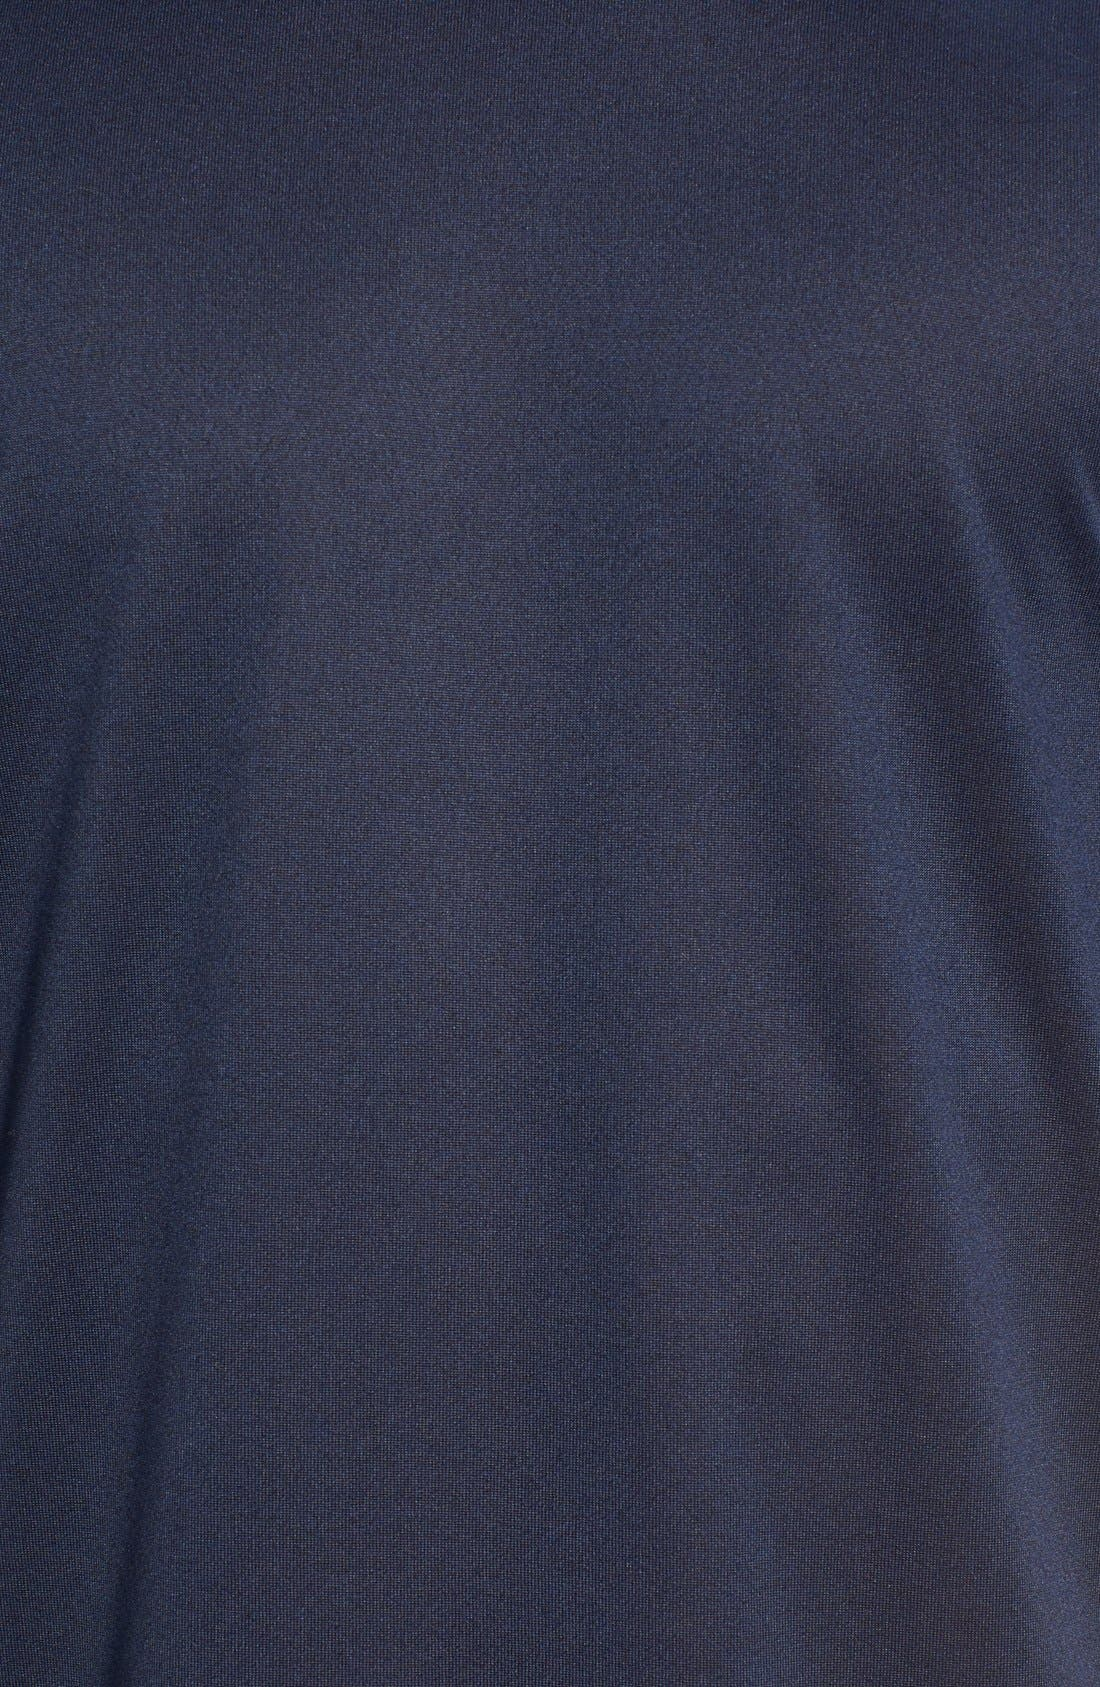 Alternate Image 5  - Nike 'Legend 2.0' Long Sleeve Dri-FIT Training T-Shirt